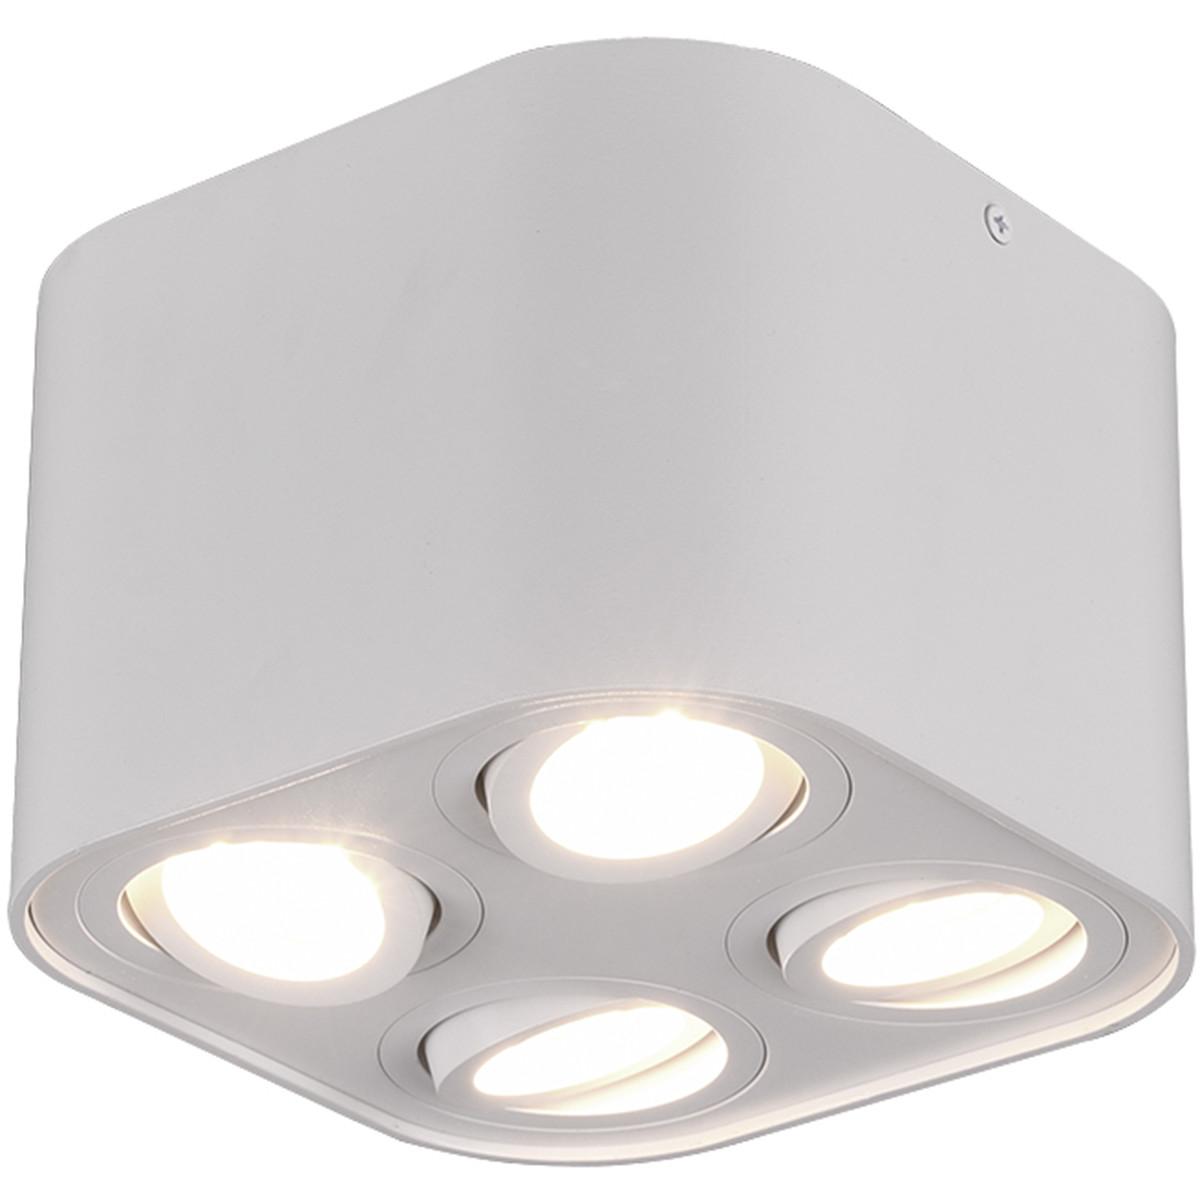 LED Plafondlamp - Plafondverlichting - Trion Cosmin - GU10 Fitting - 4-lichts - Vierkant - Mat Wit -